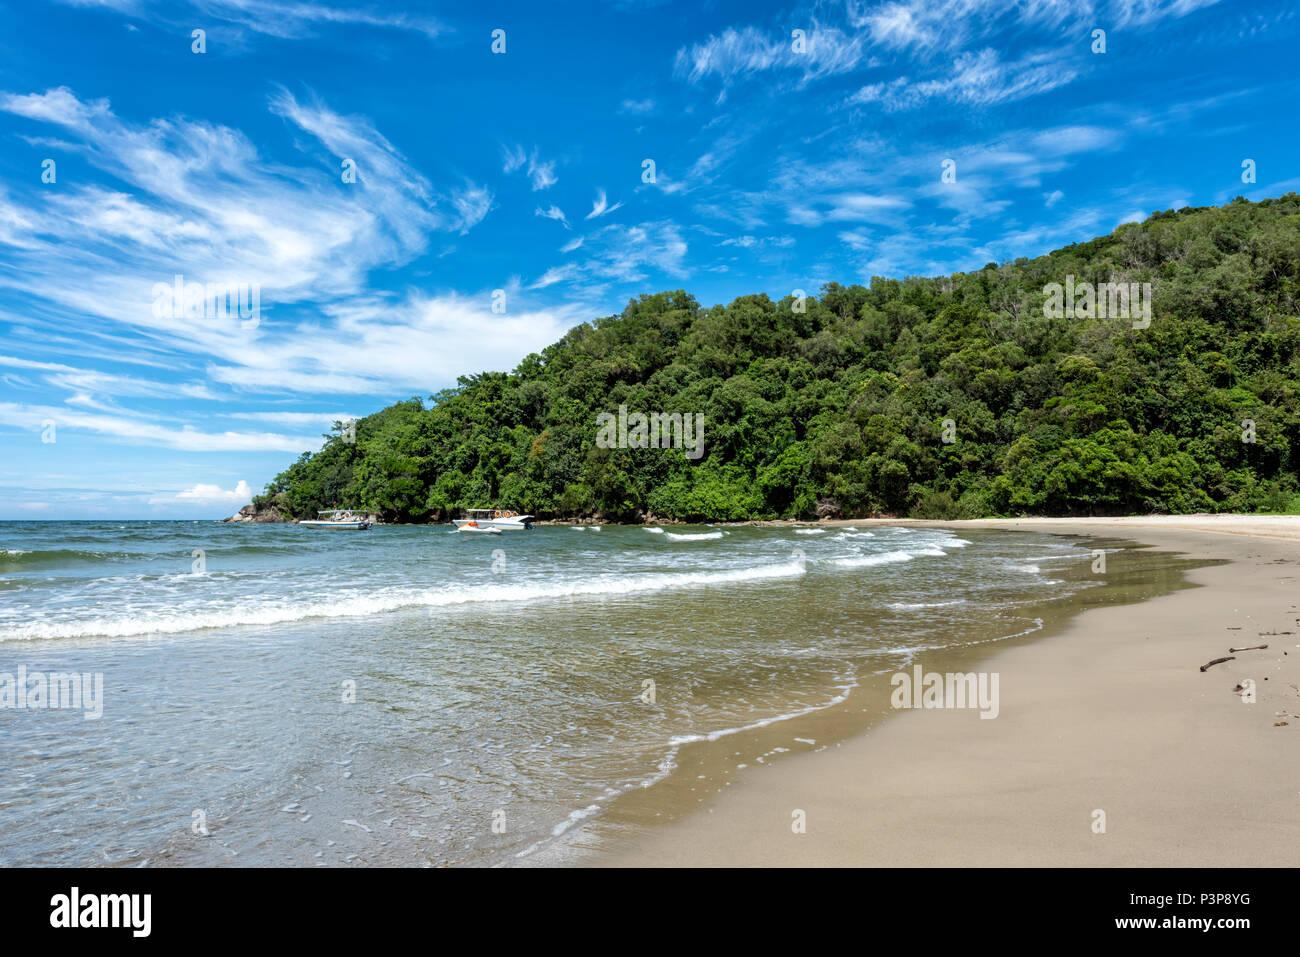 Das Südchinesische Meer runden den Strand in Kota Kinabalu auf Borneo, Malaysia Stockbild